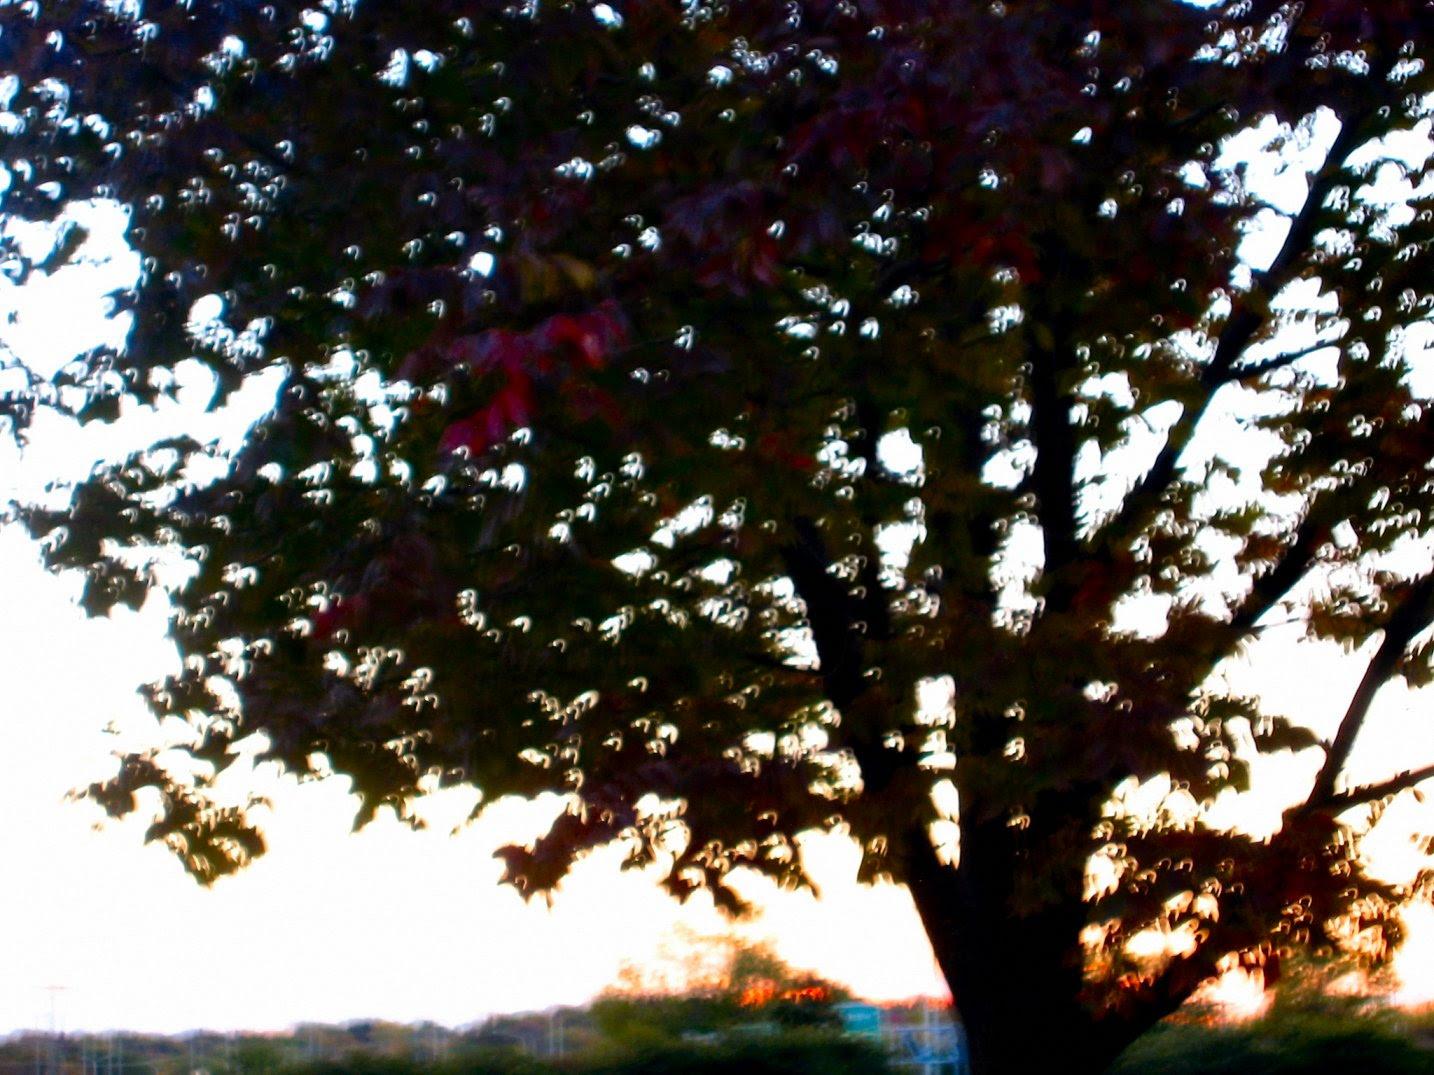 Wiconsin Autumn Photo - soul-amp.com